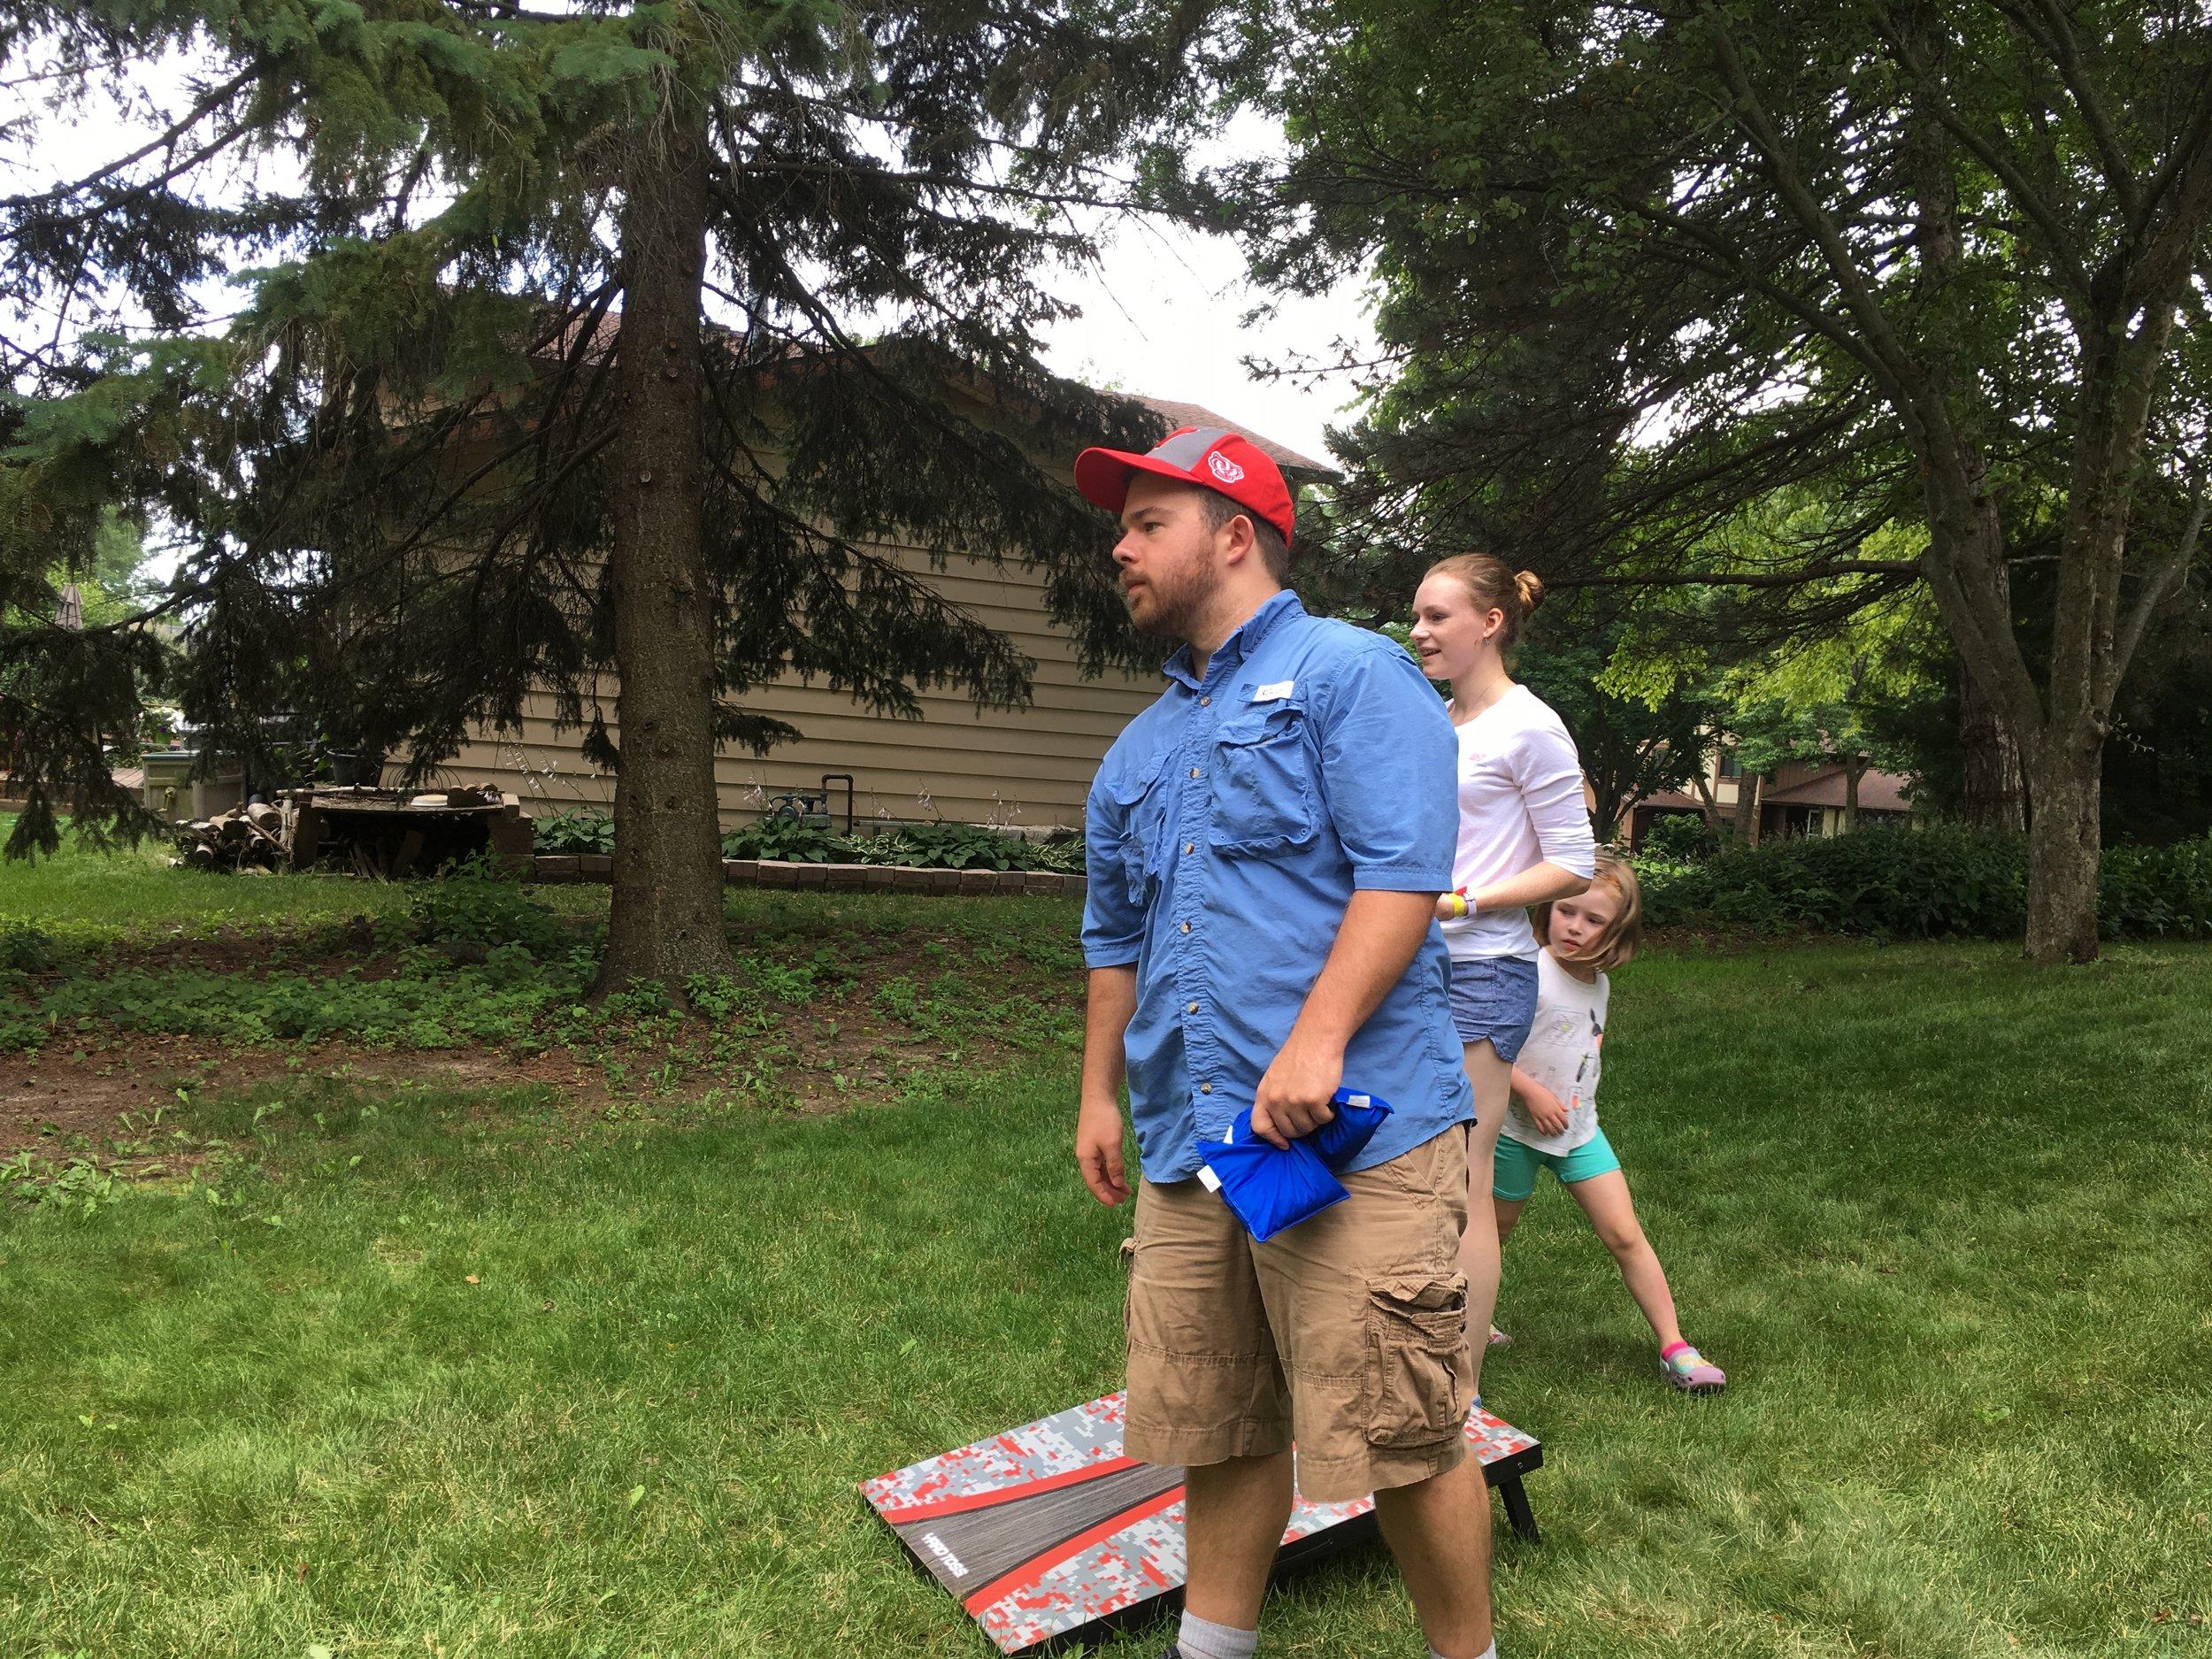 Chris shows his Ohio cornhole expertise.